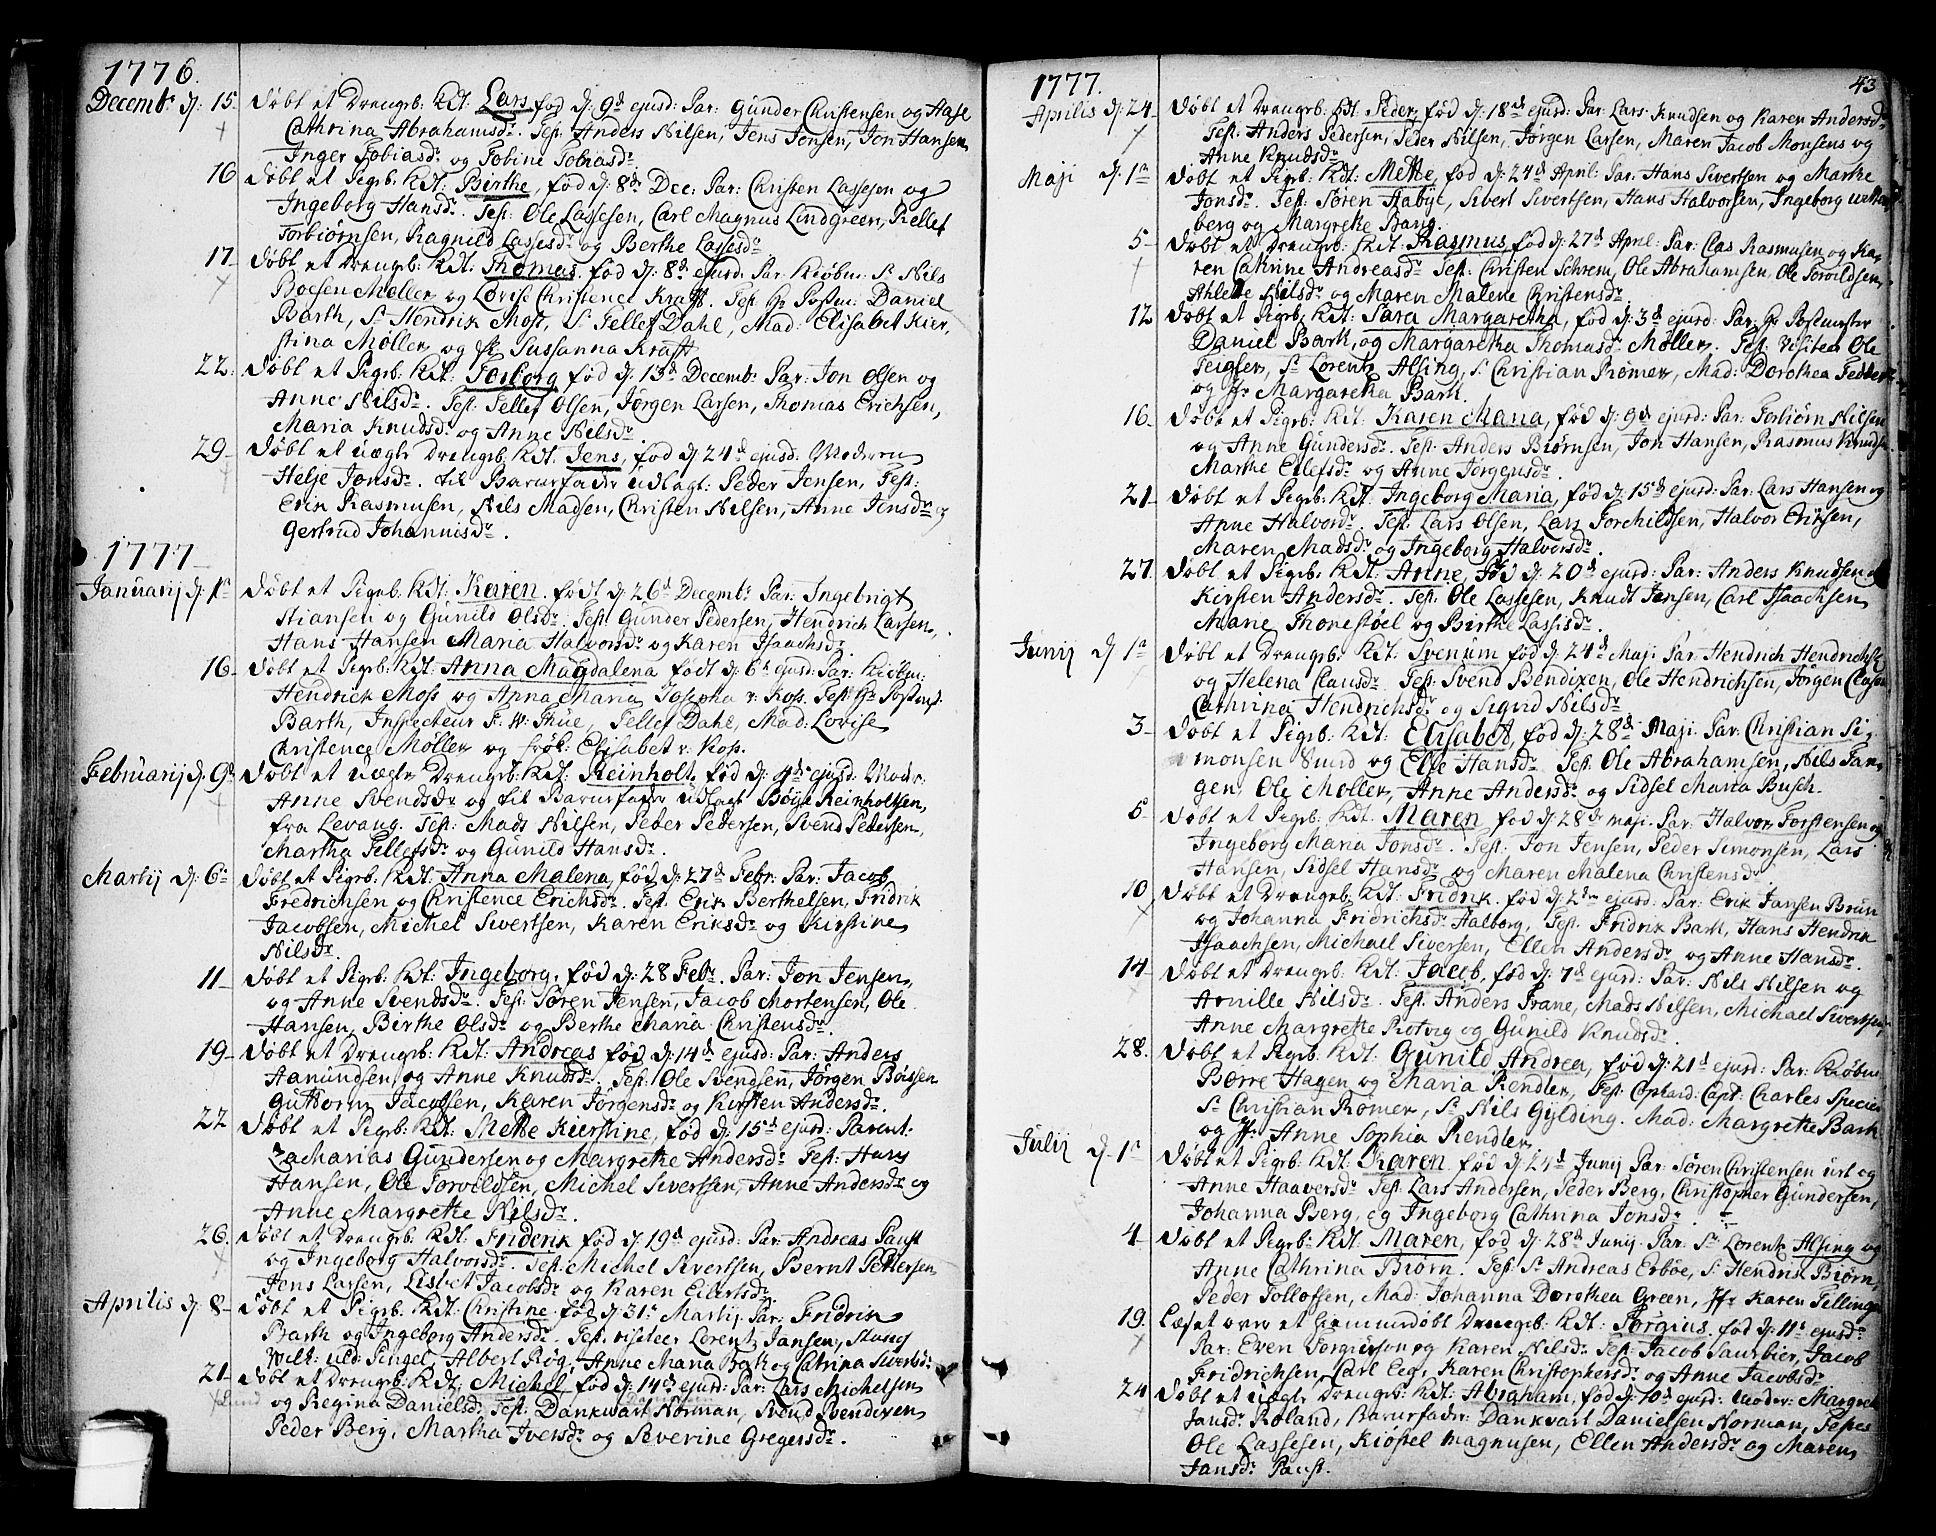 SAKO, Kragerø kirkebøker, F/Fa/L0002: Ministerialbok nr. 2, 1767-1802, s. 43